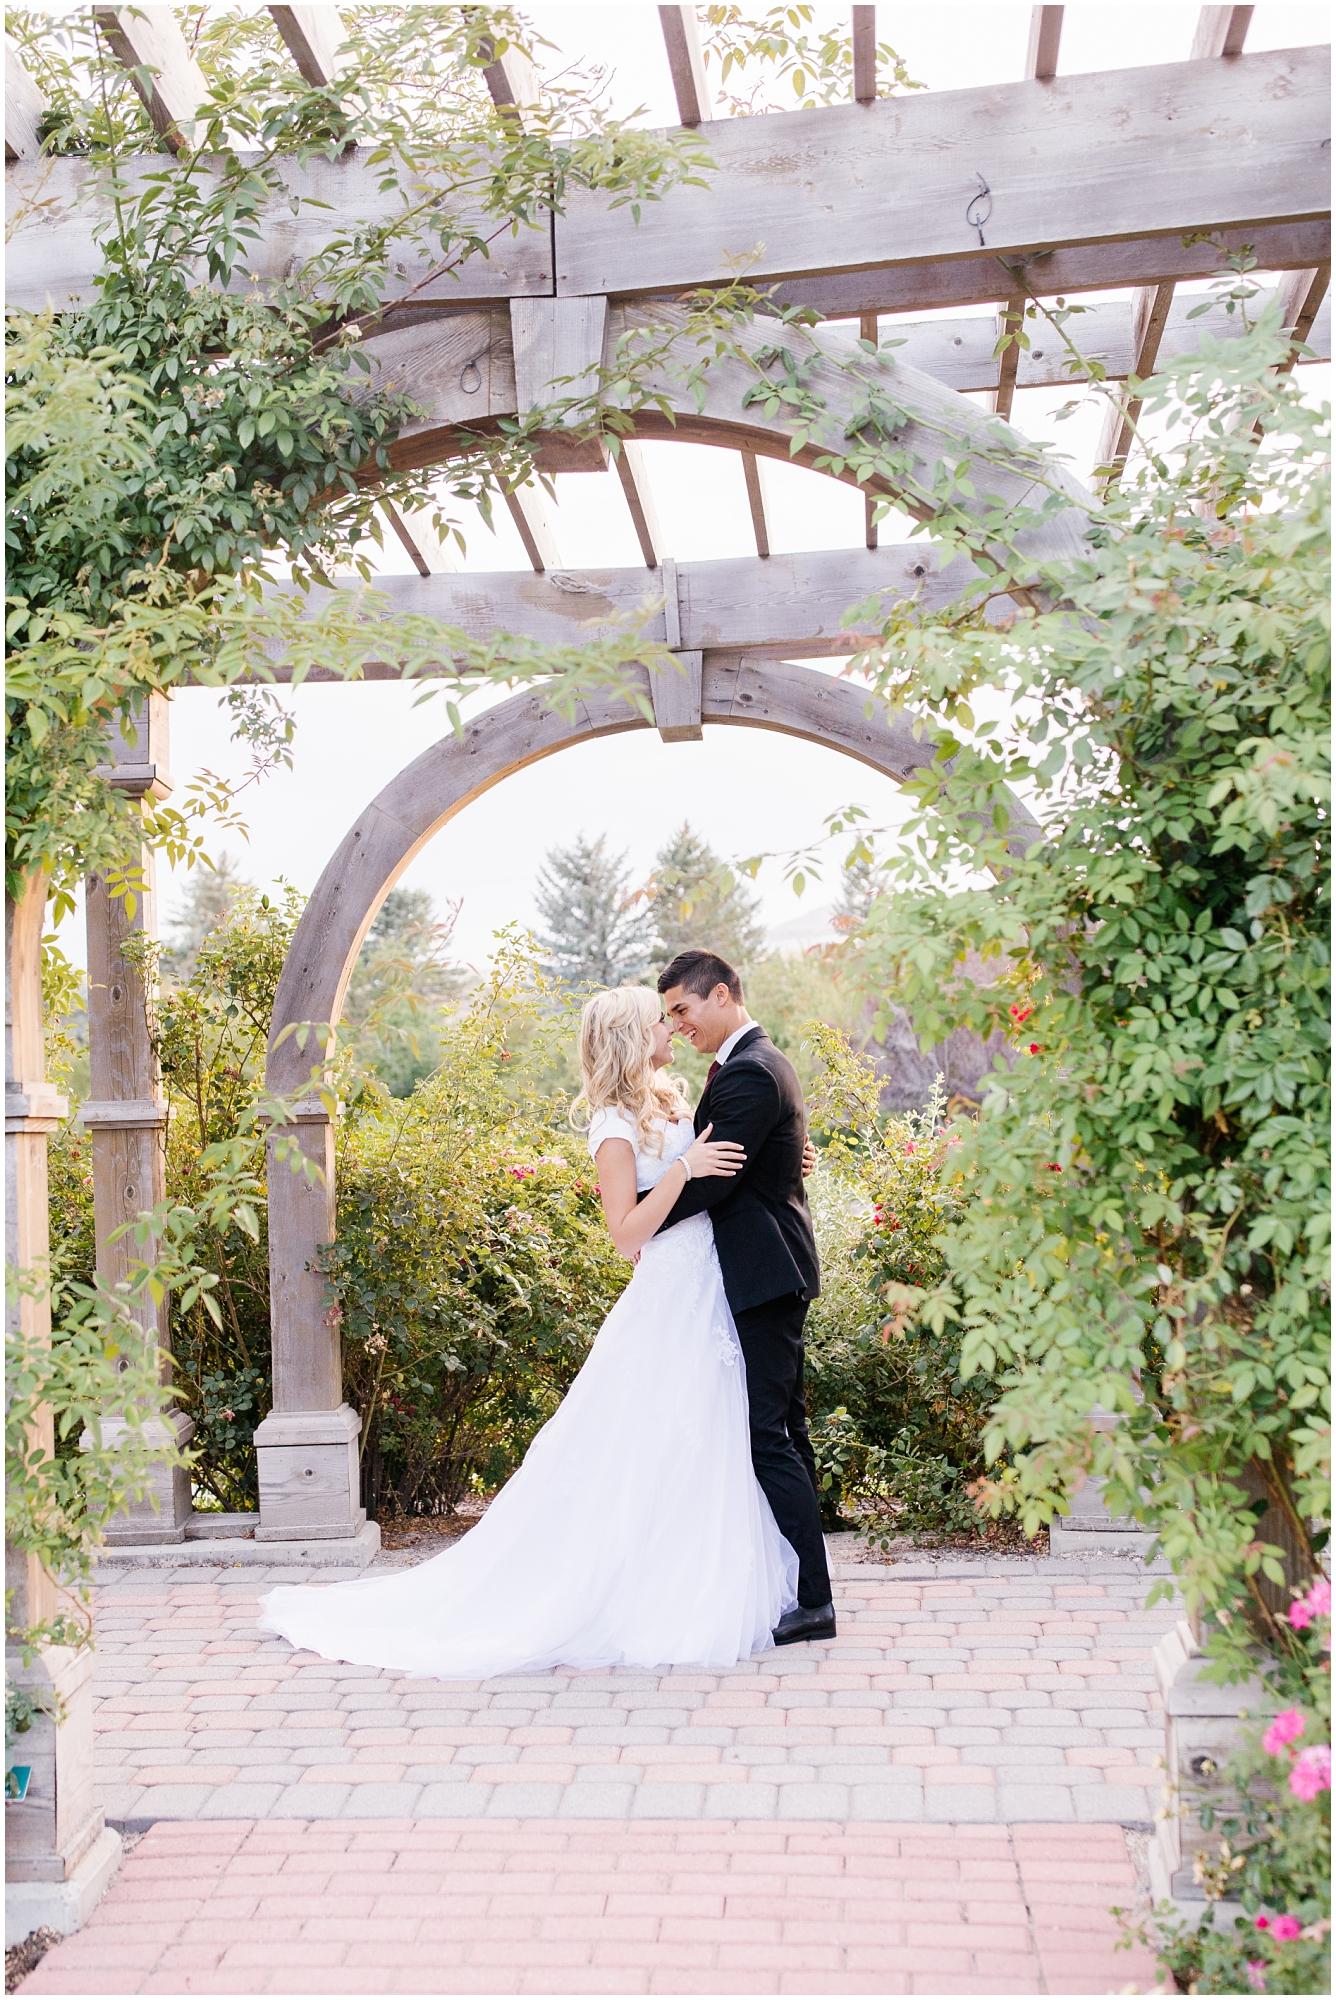 CHBridals-120_Lizzie-B-Imagery-Utah-Wedding-Photographer-Salt-Lake-City-Park-City-Thanksgiving-Point-Ashton-Gardens.jpg